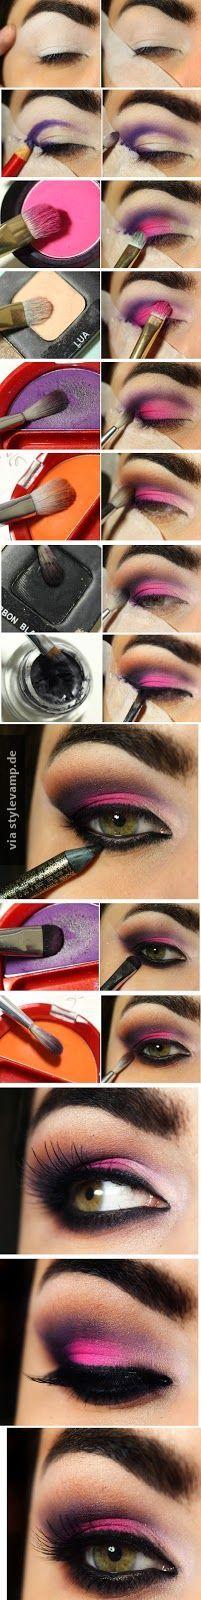 Farbenfrohes Augen Make-up <3